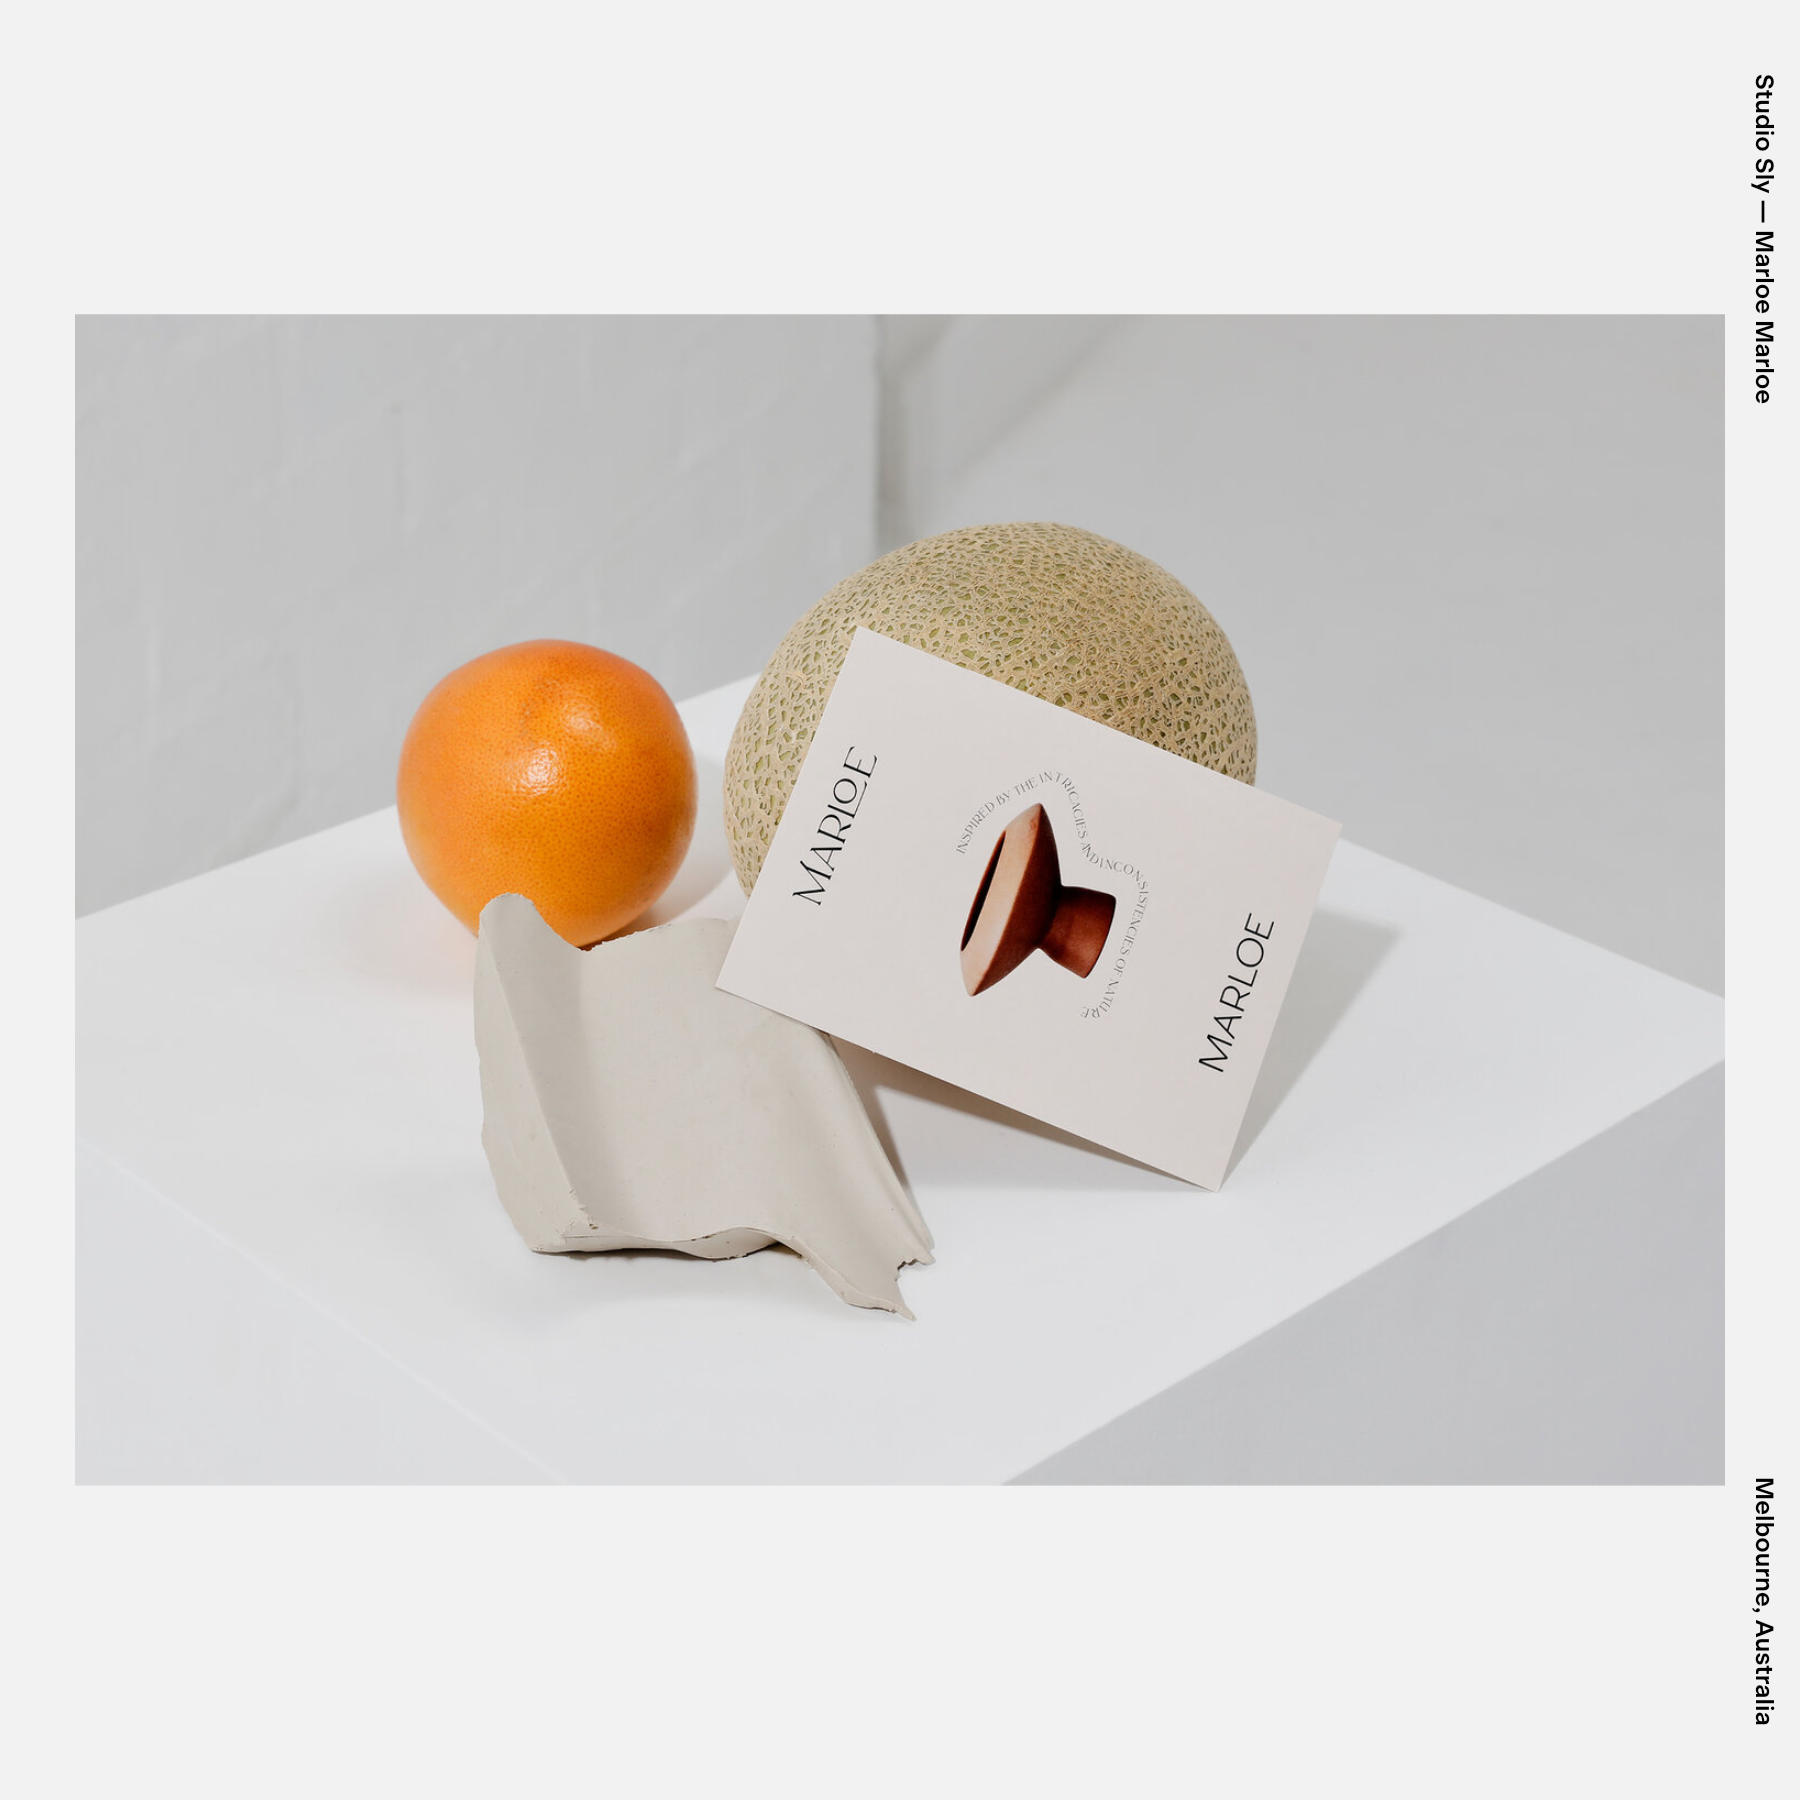 Studio Sly — Marloe Marloe